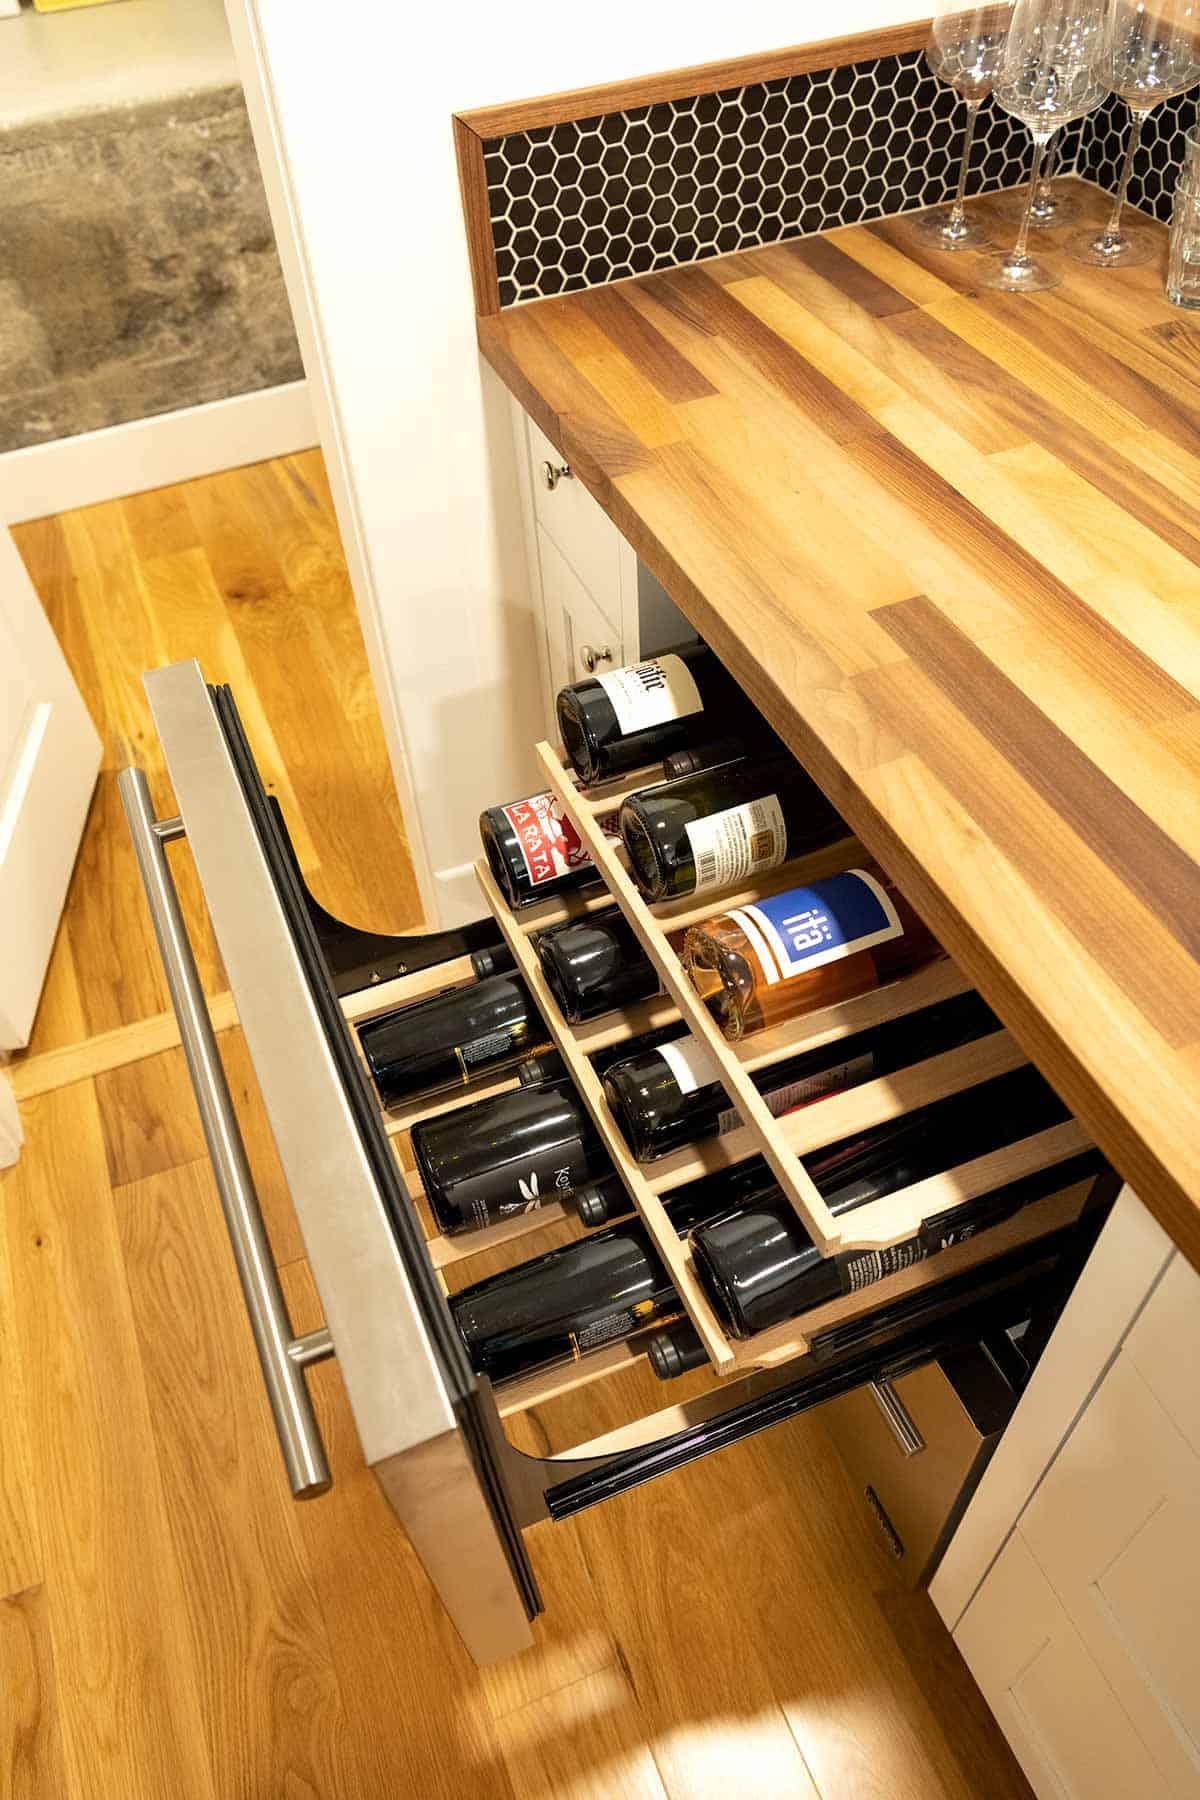 NewAir 24-inch wine fridge